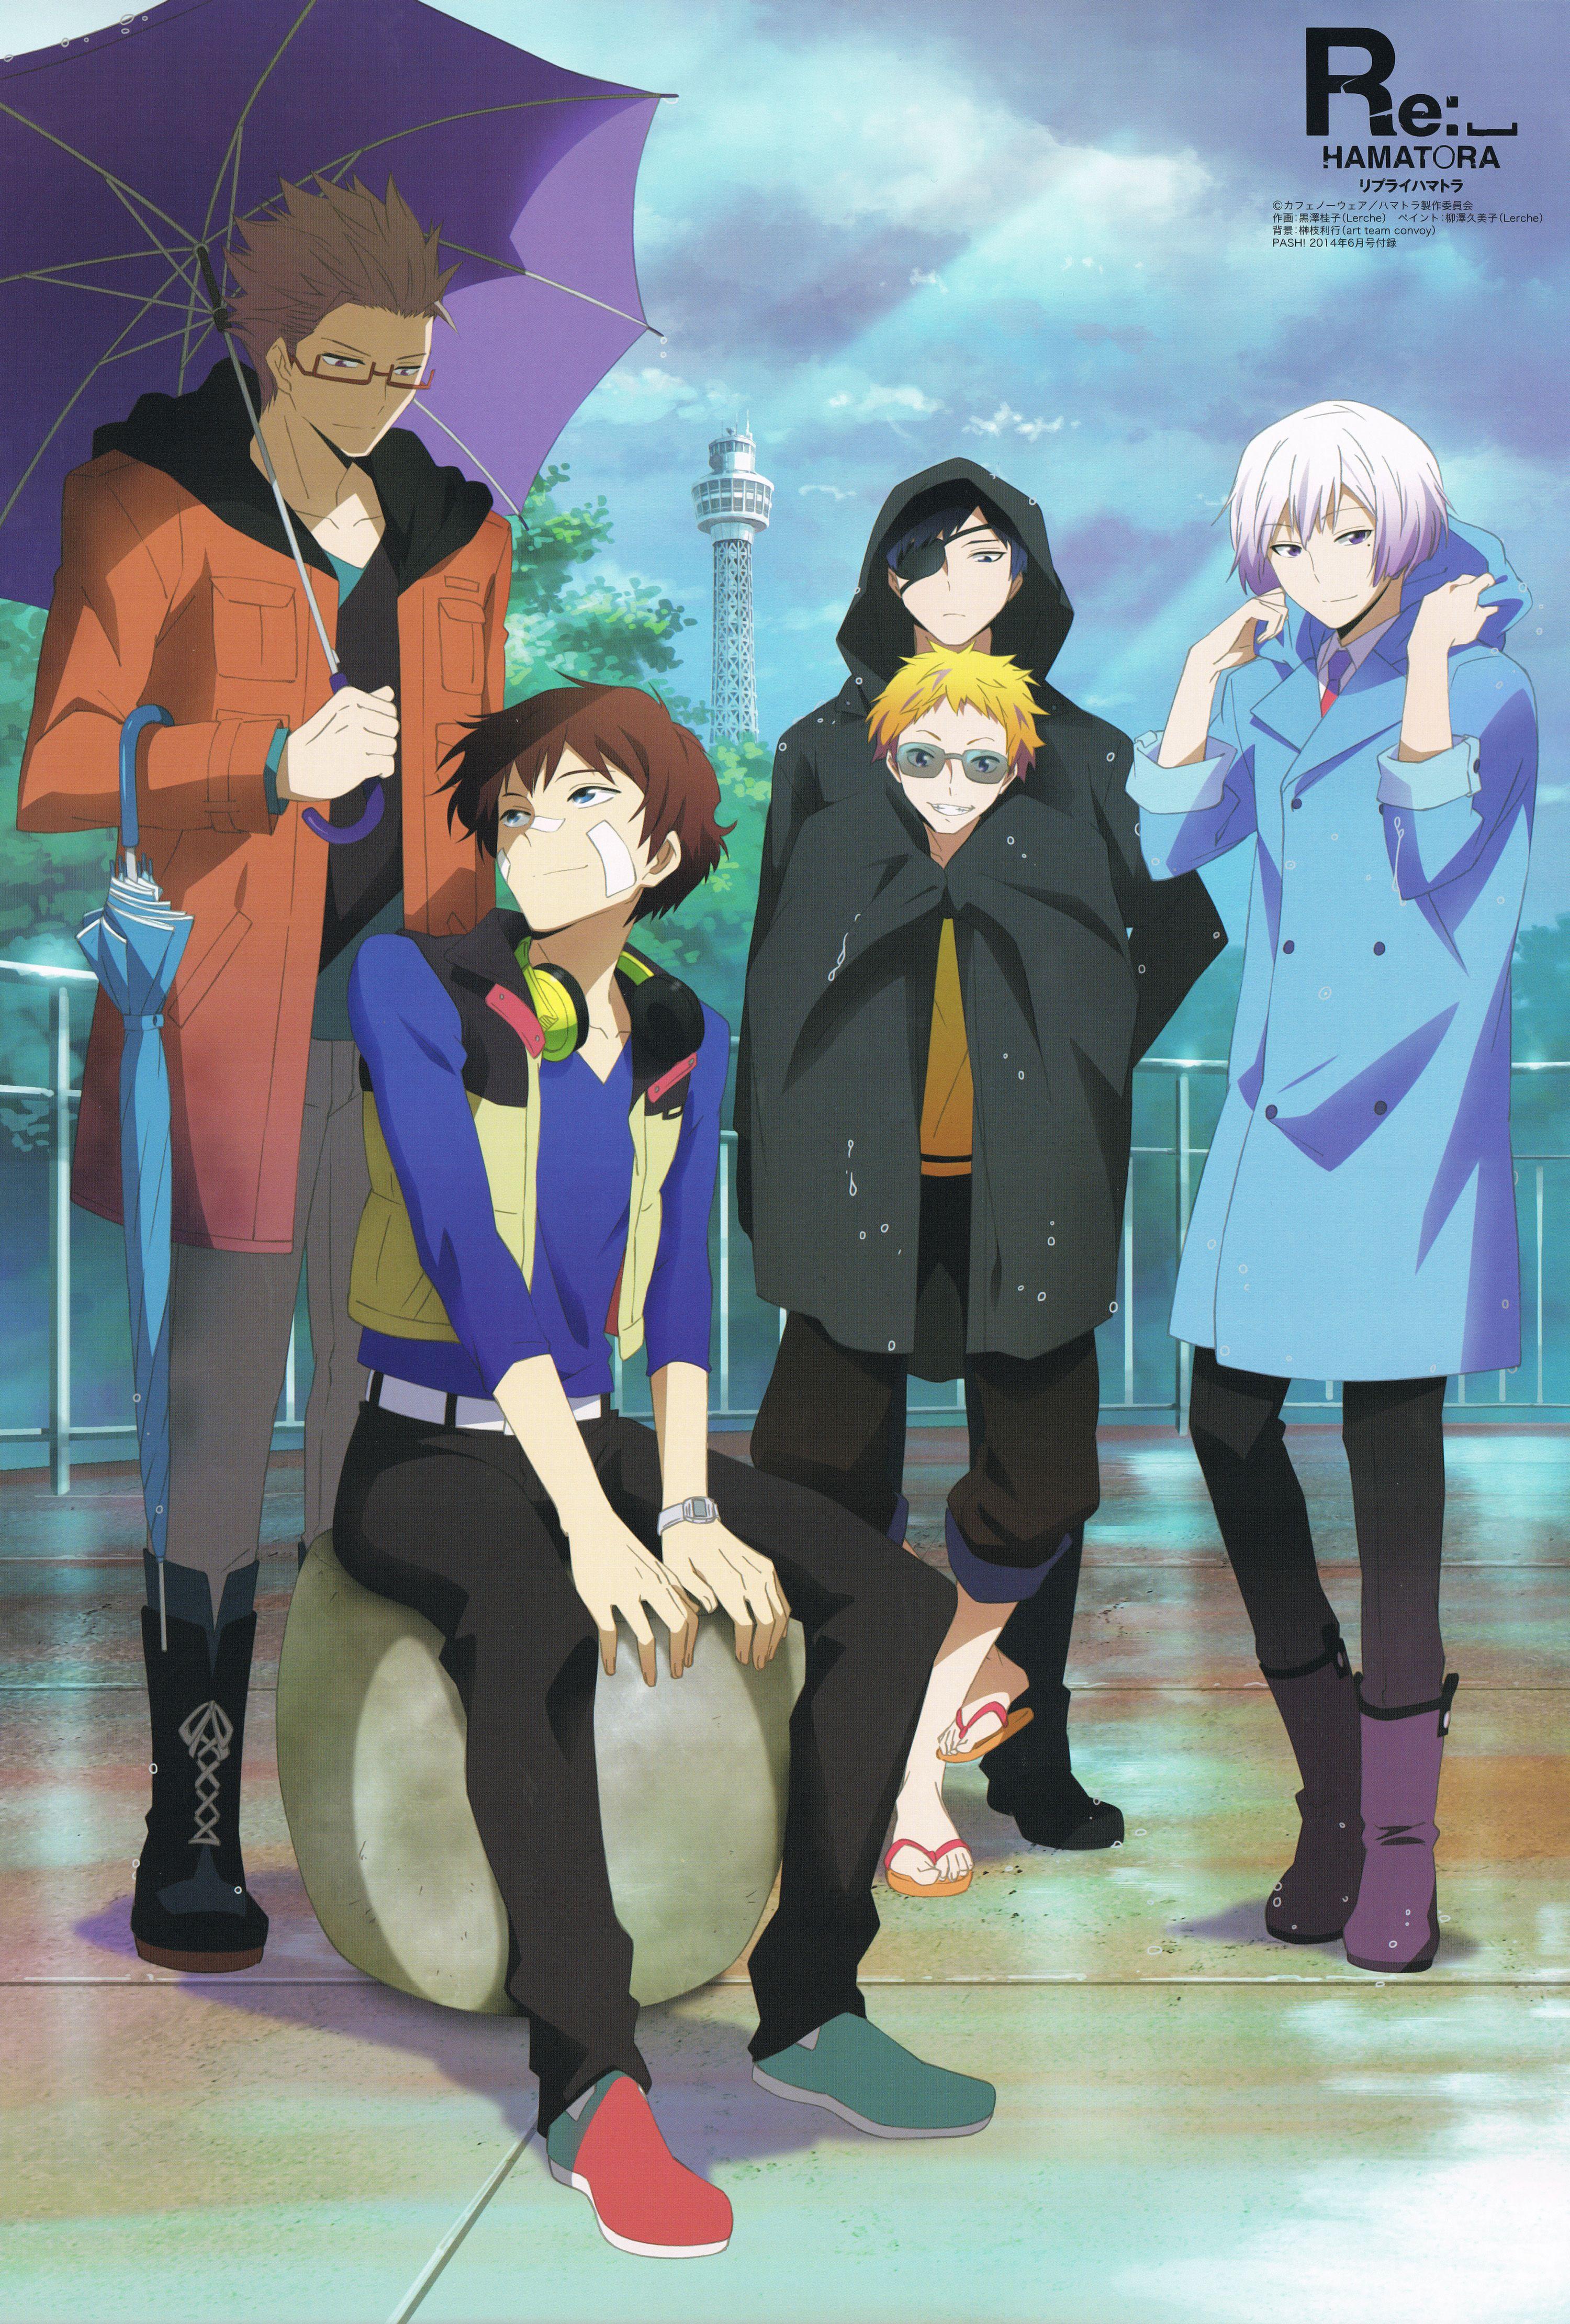 Hamatora Full 1719128 Jpg 3000 4440 Hamatora Anime Anime Images